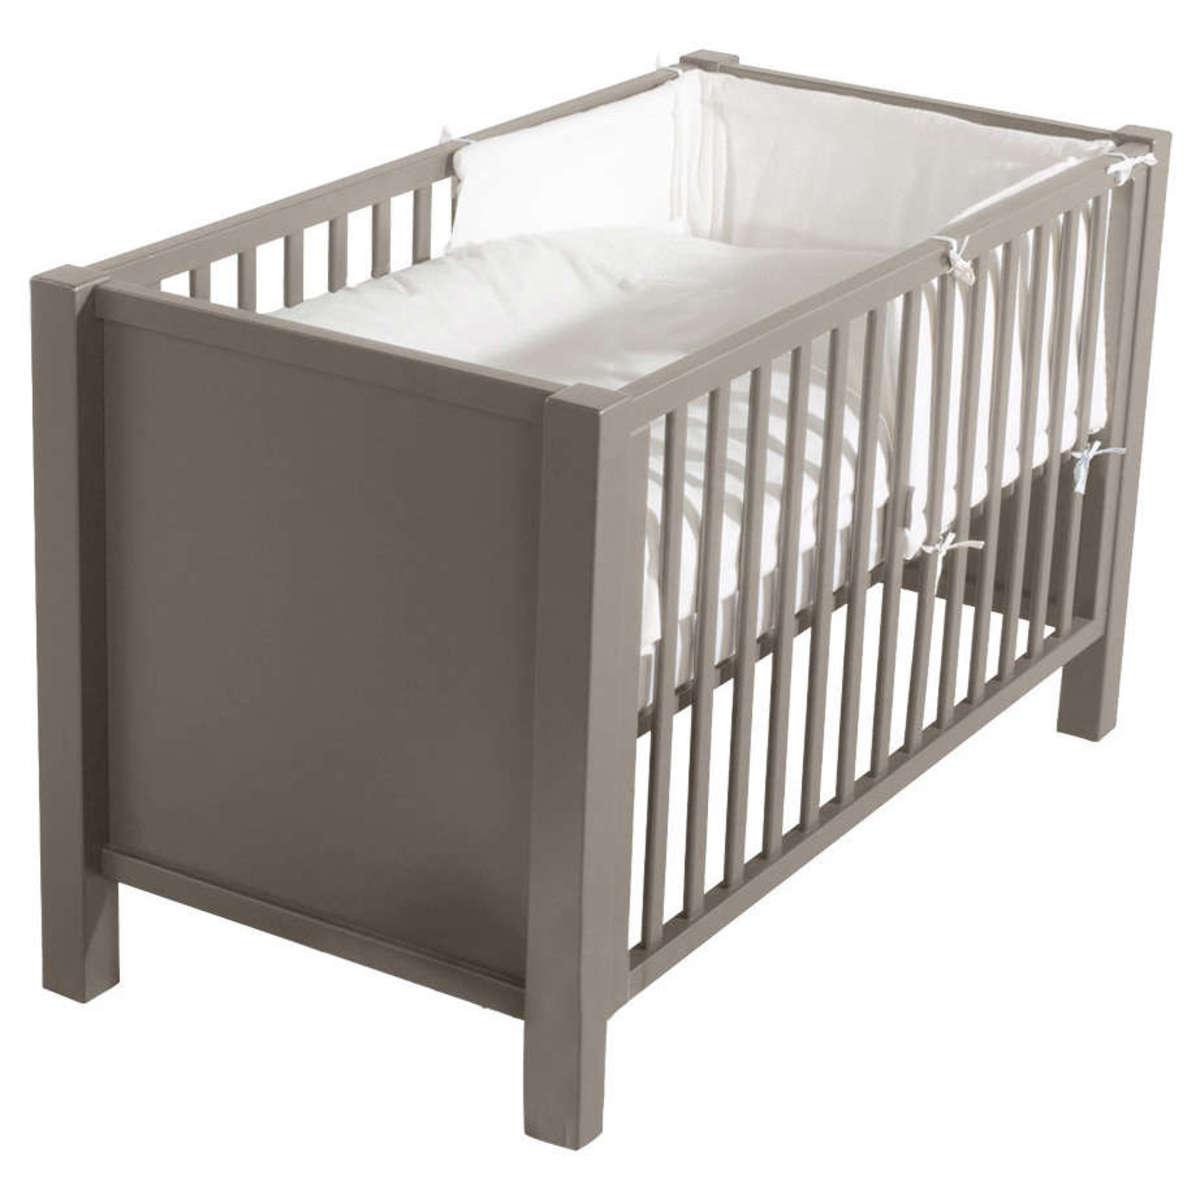 quax lit b b marie sofie provence lit b b quax sur l. Black Bedroom Furniture Sets. Home Design Ideas